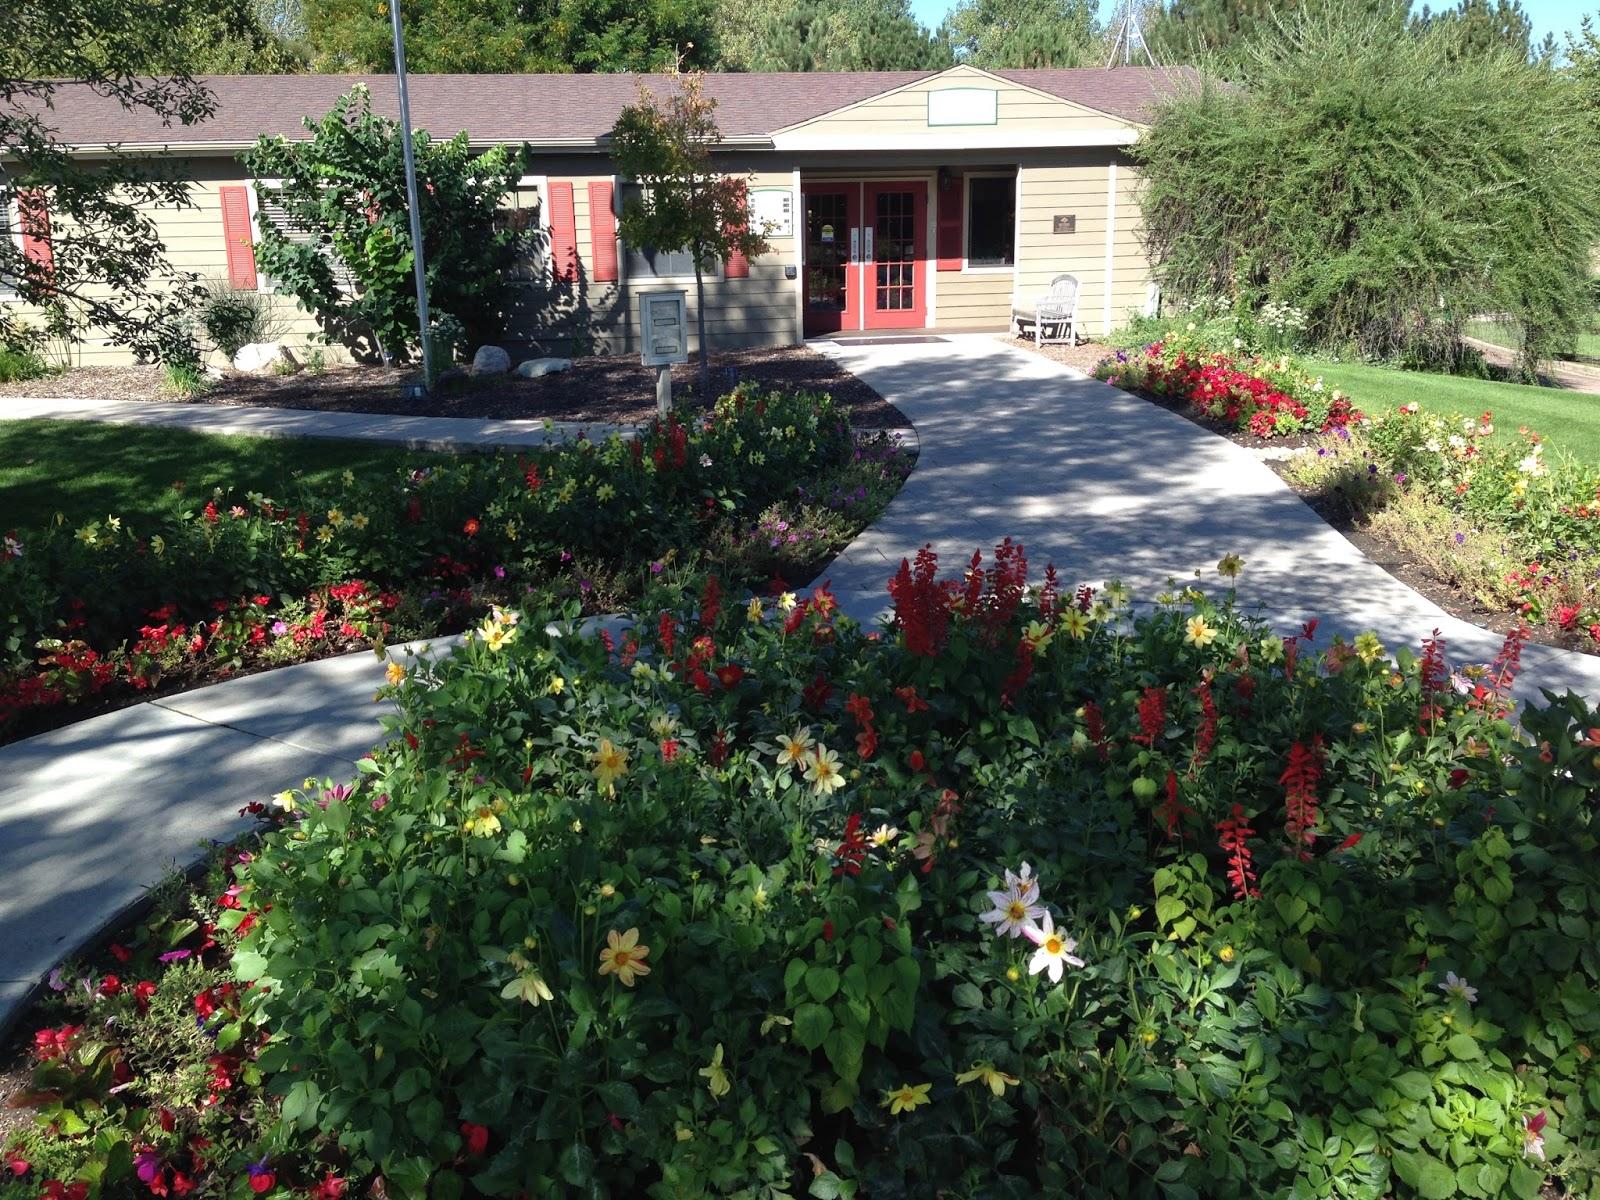 Colorado Garden Punch List Visit Before The Snow Flies